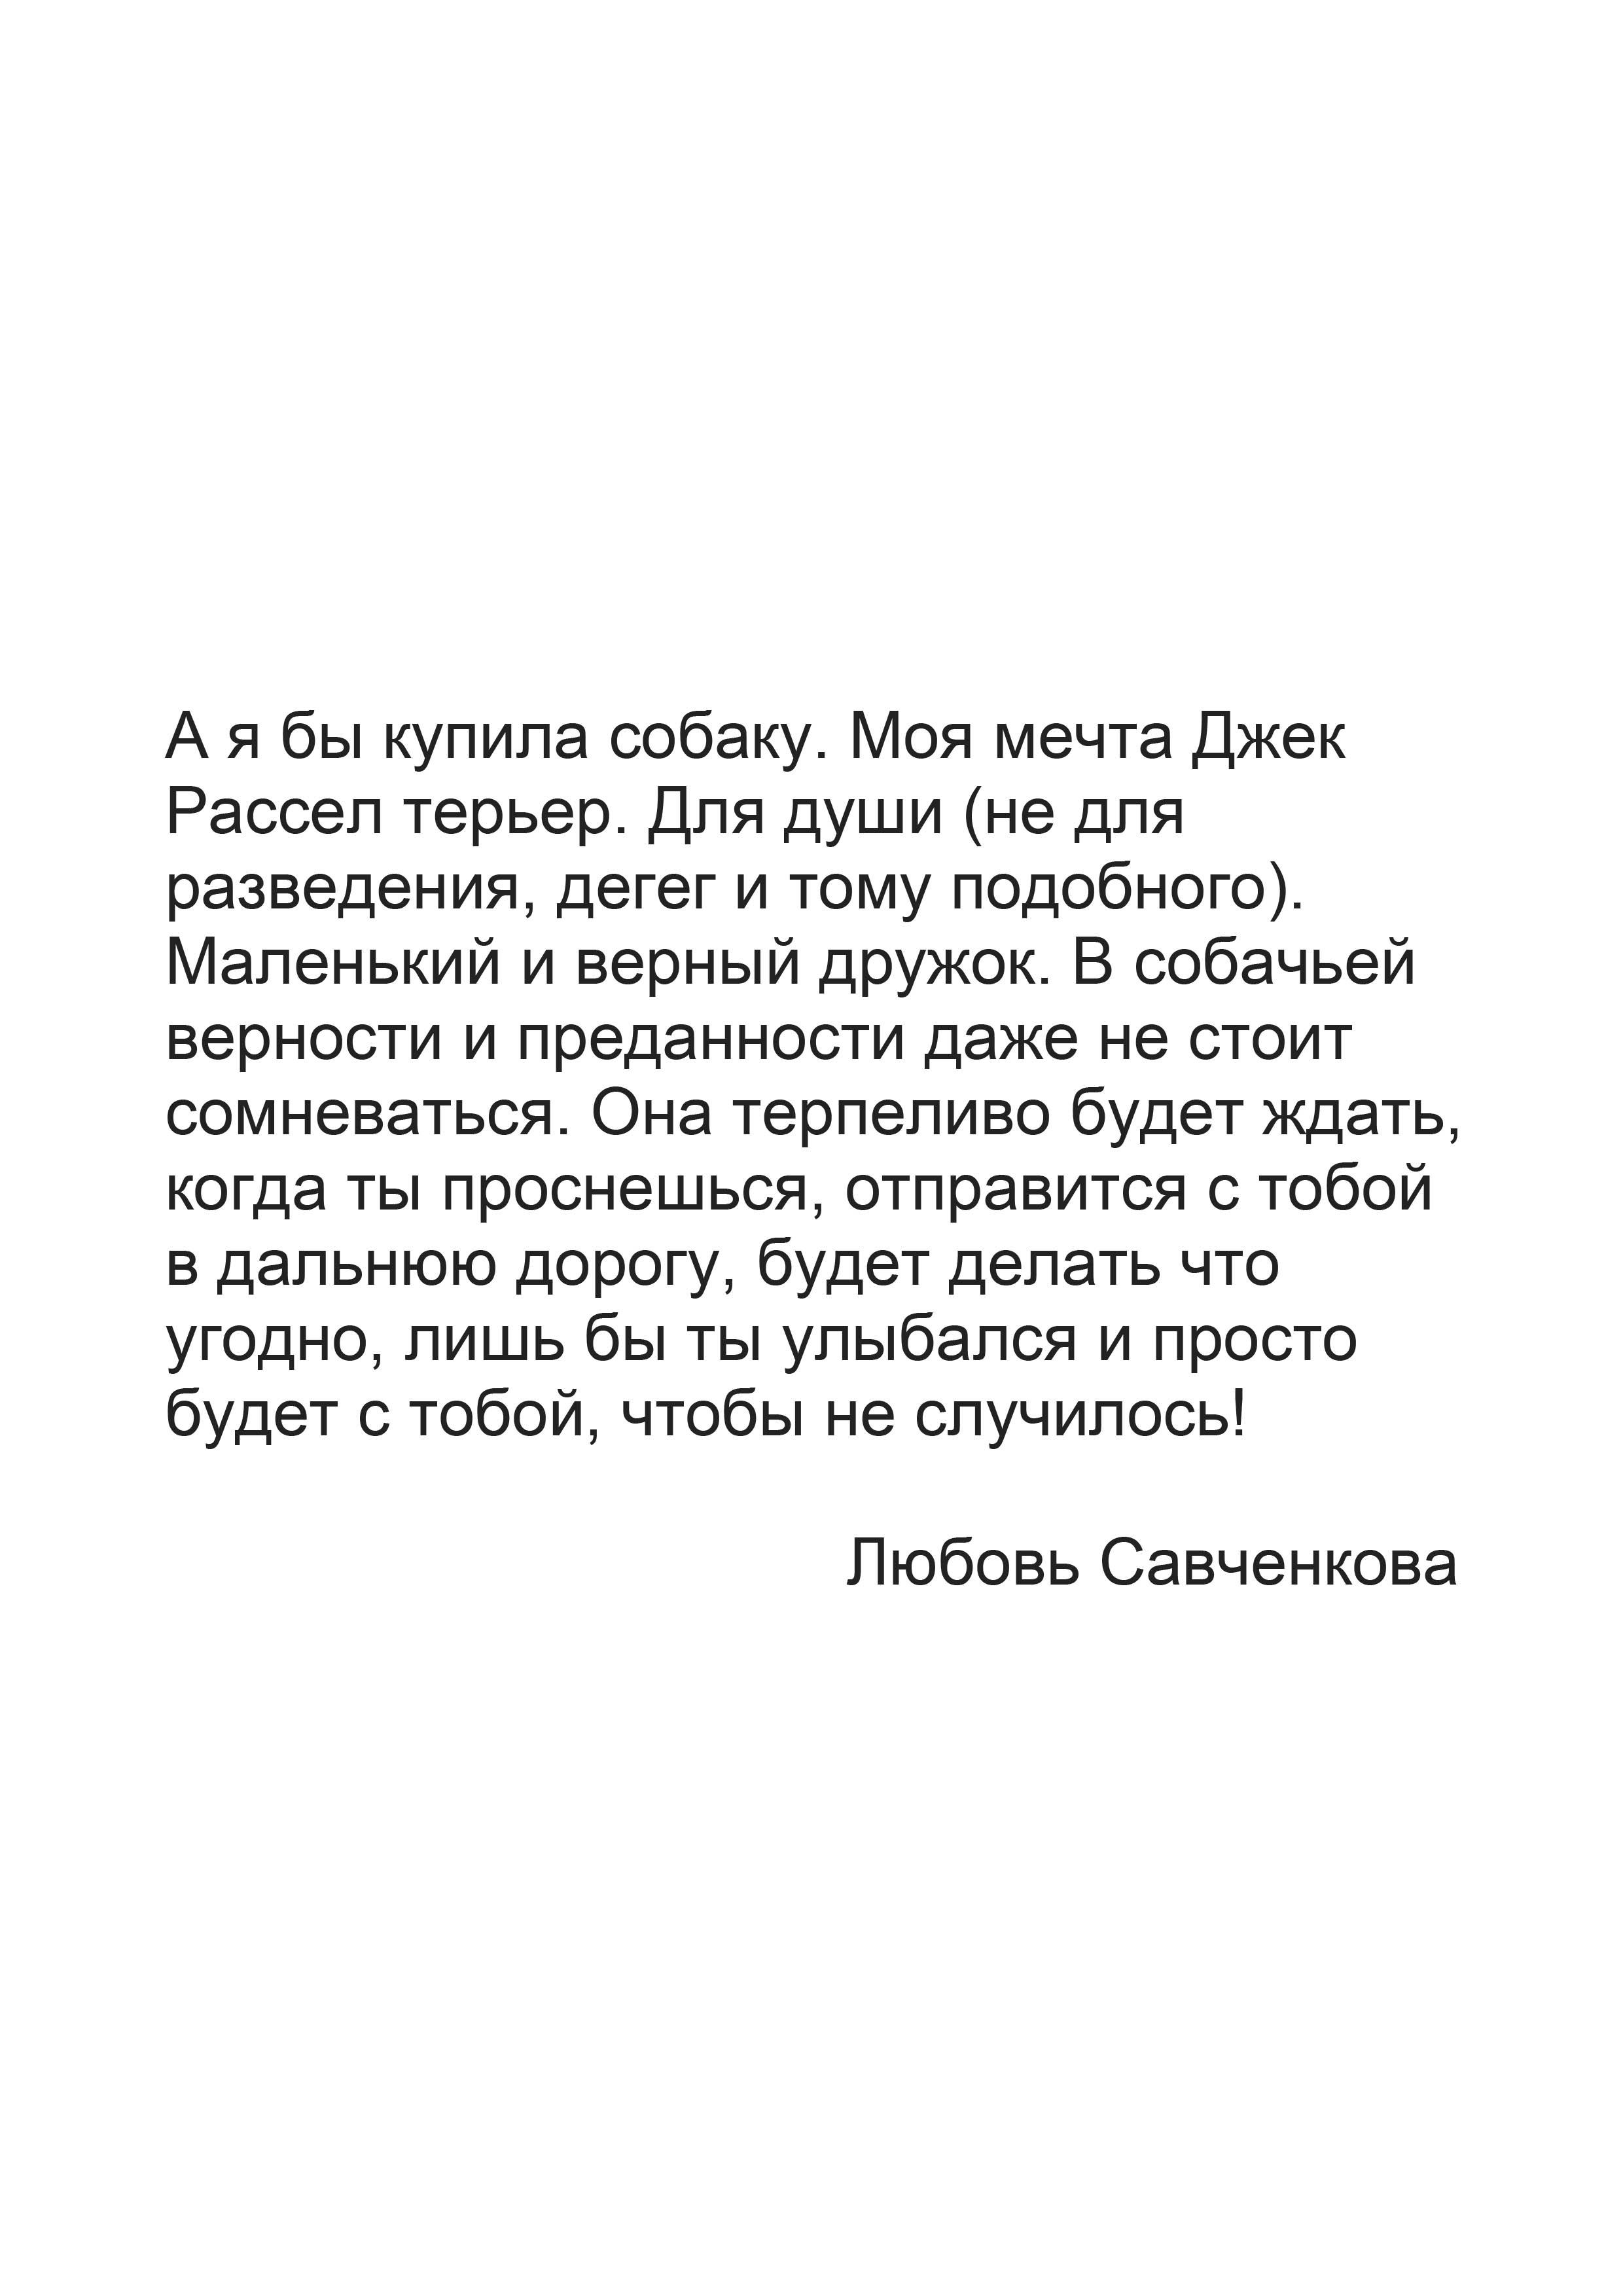 Любовь Савченкова